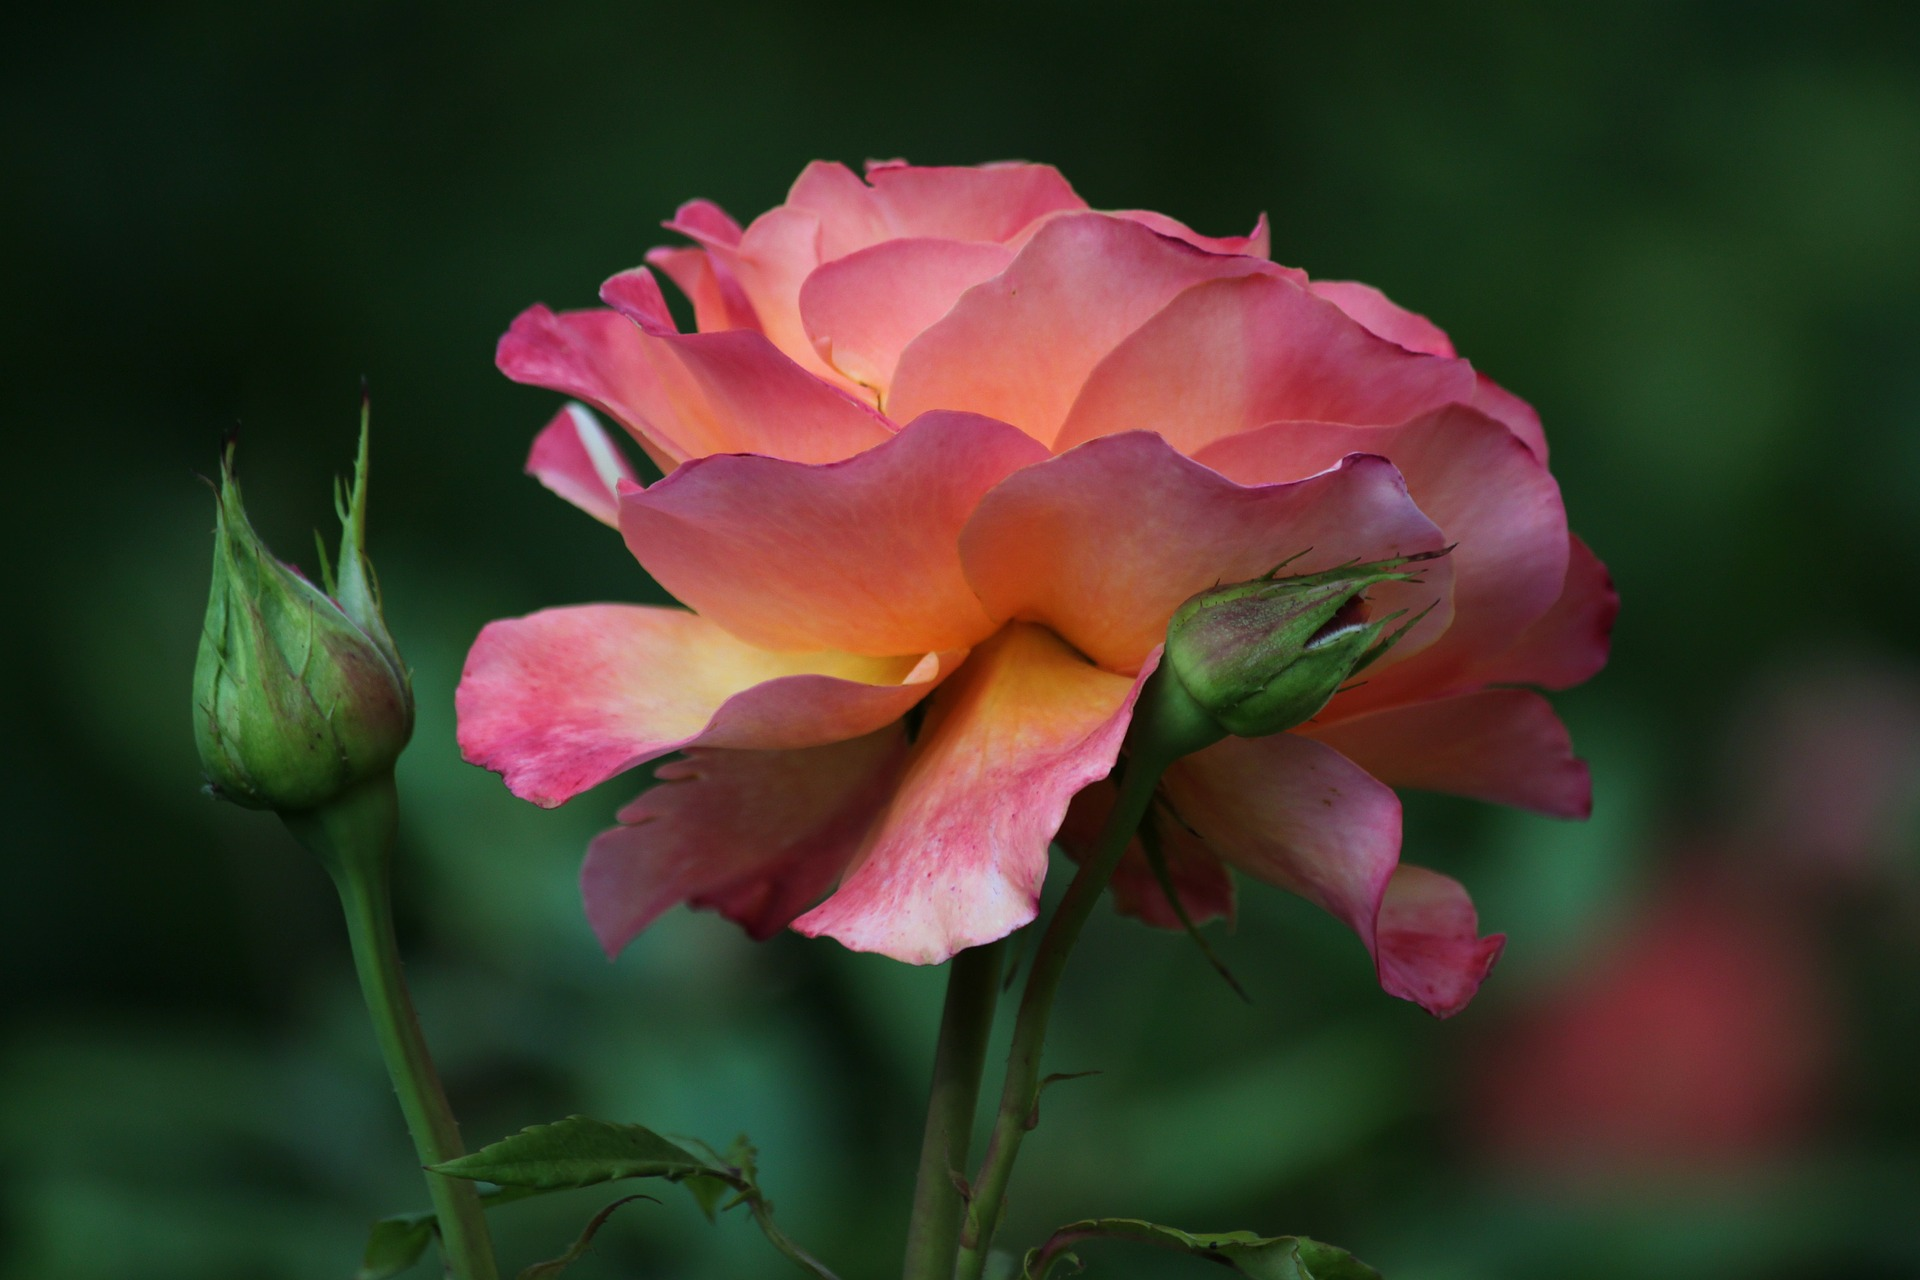 rose-340624_1920.jpg